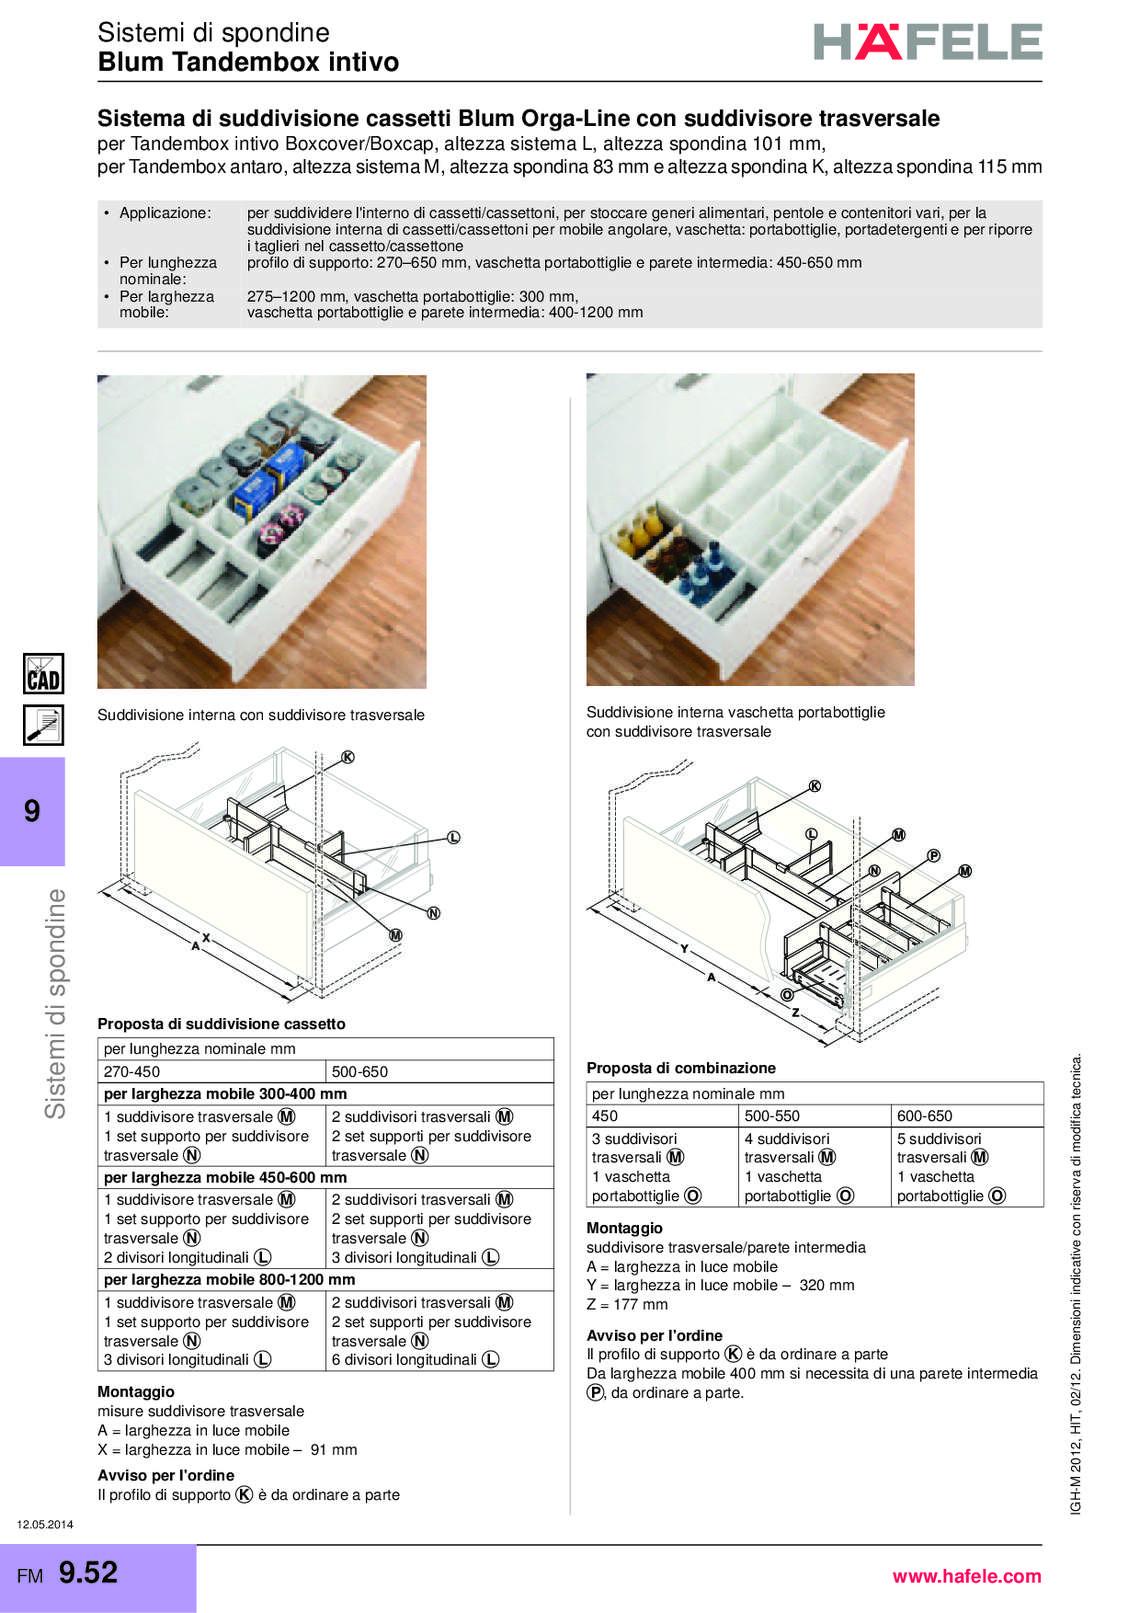 hafele-spondine-e-guide-per-mobili_40_063.jpg